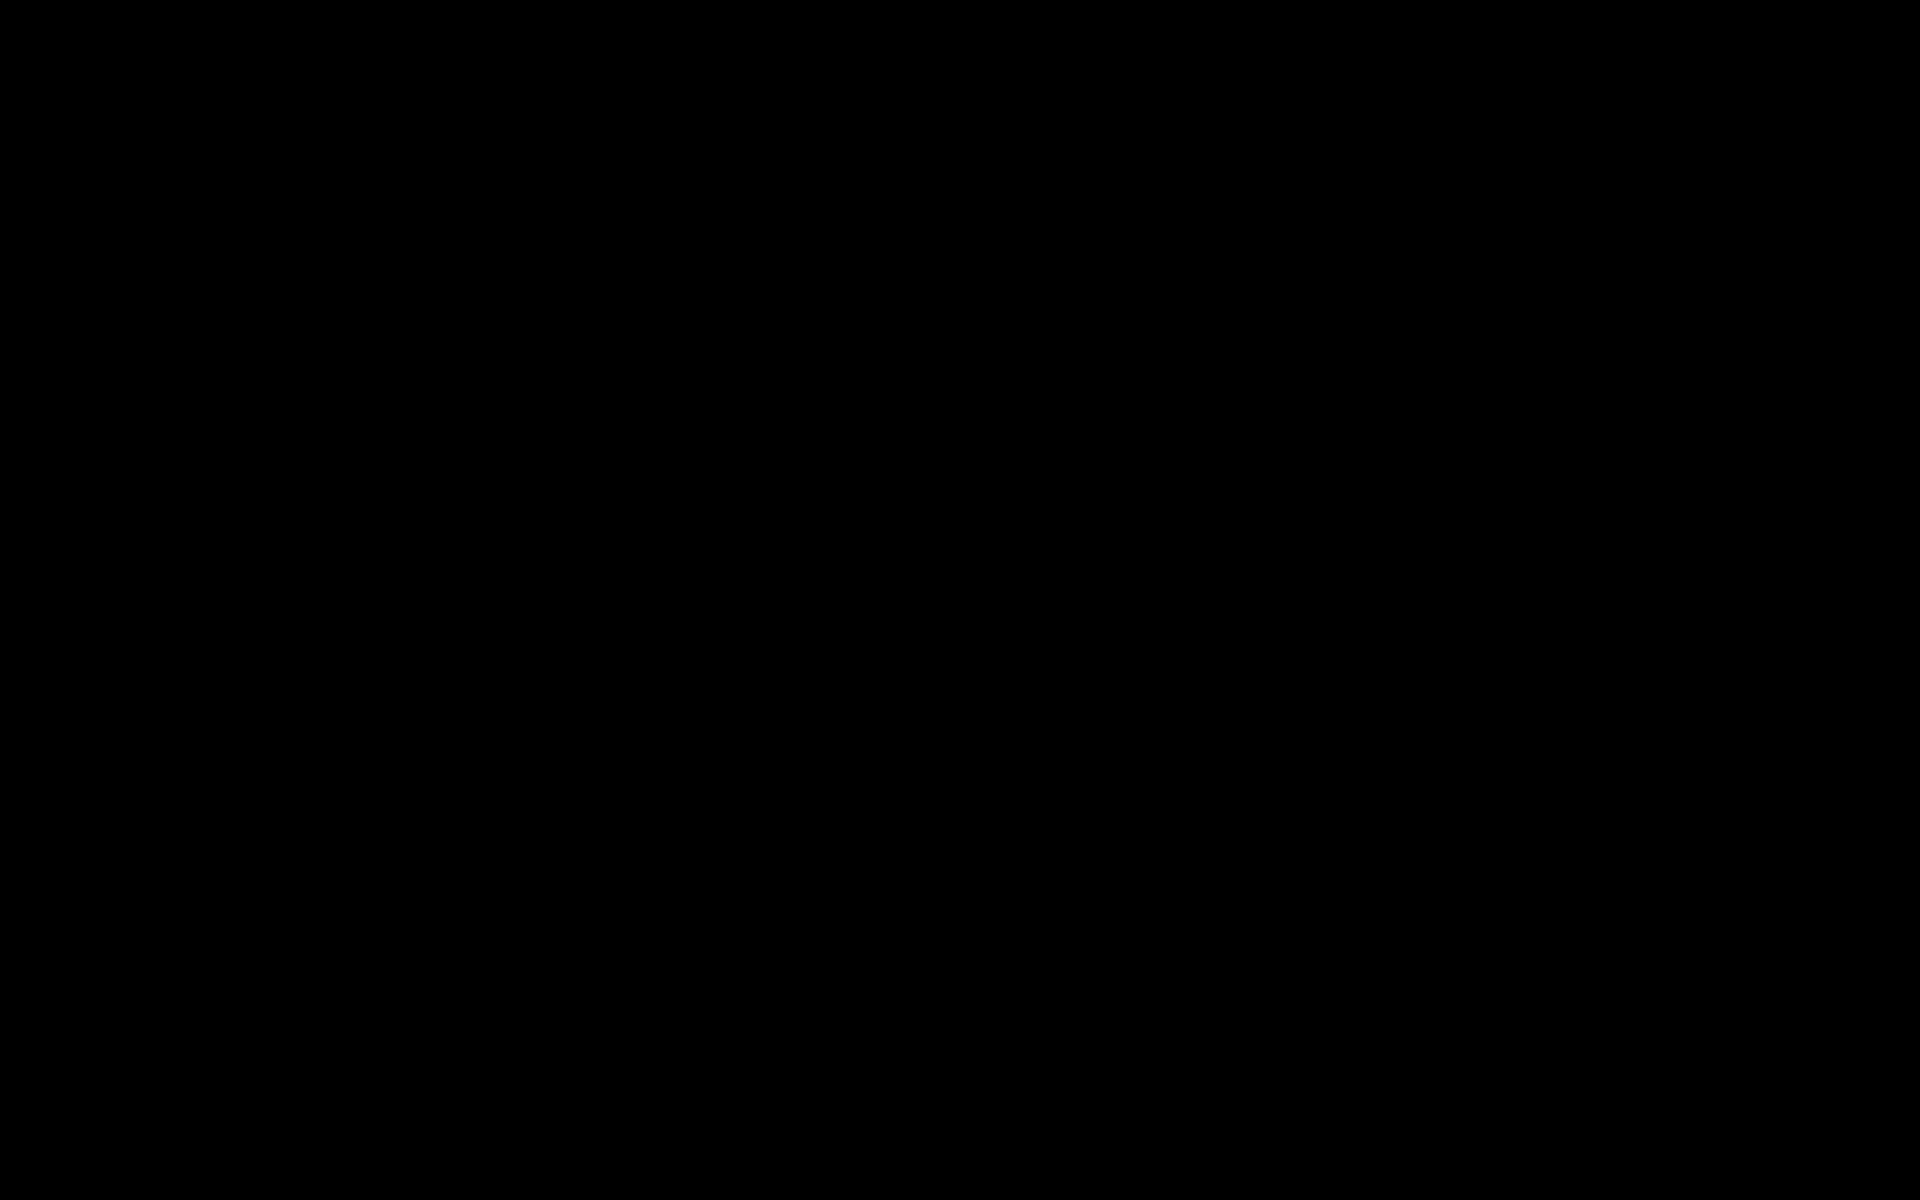 1920x1200 Black Solid Color Background